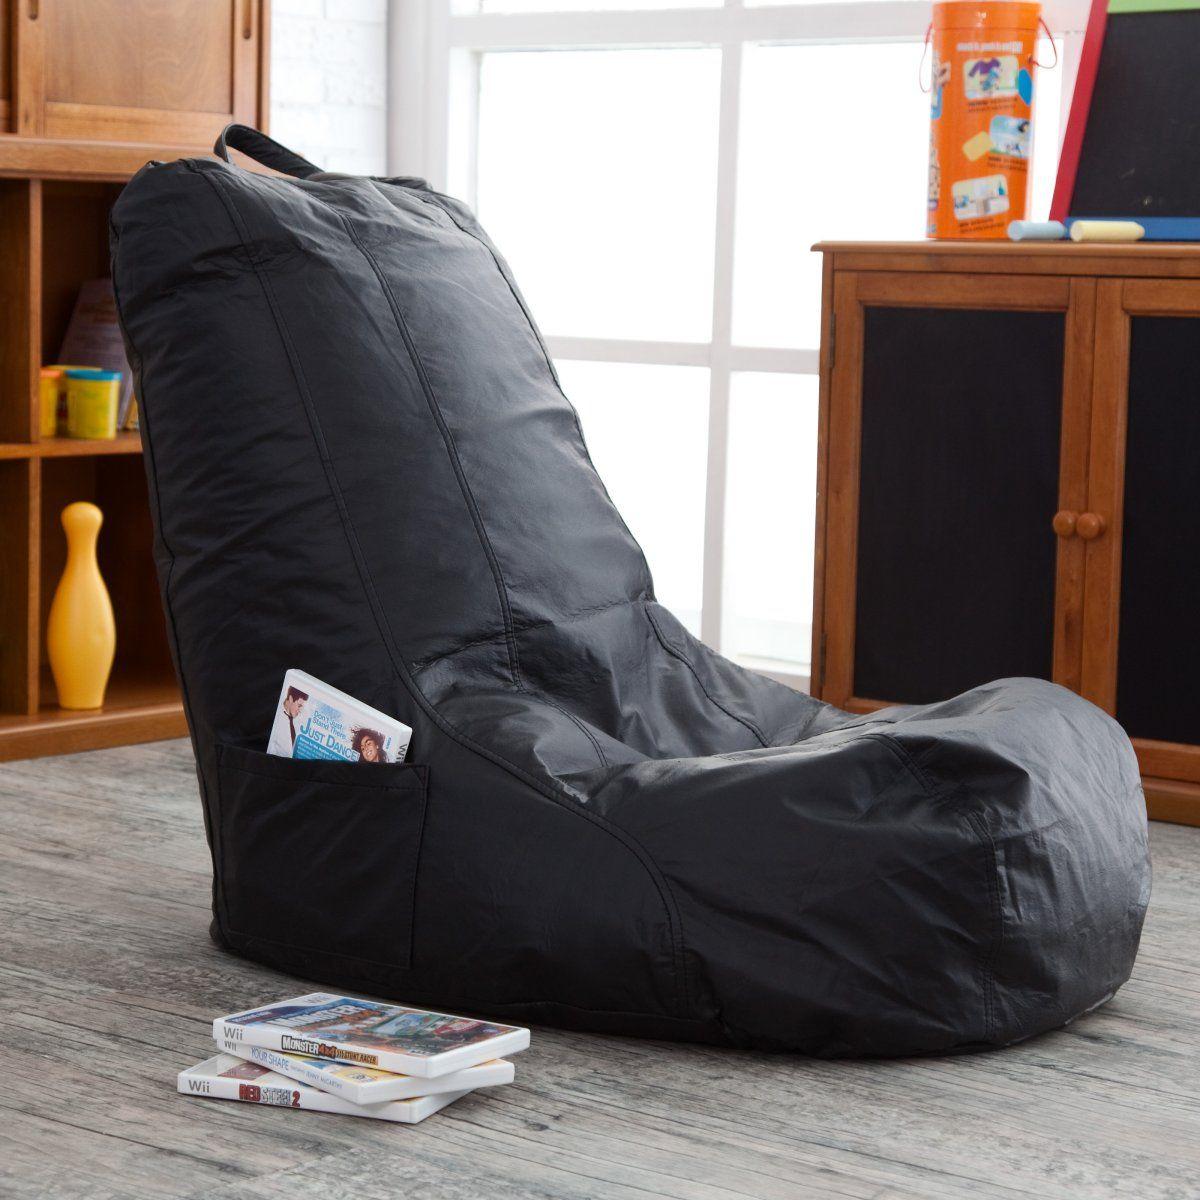 Vinyl Video Bean Bag Chair Www Hayneedle Com Bean Bag Chair Bean Bag Chair Kids Bean Bag Gaming Chair